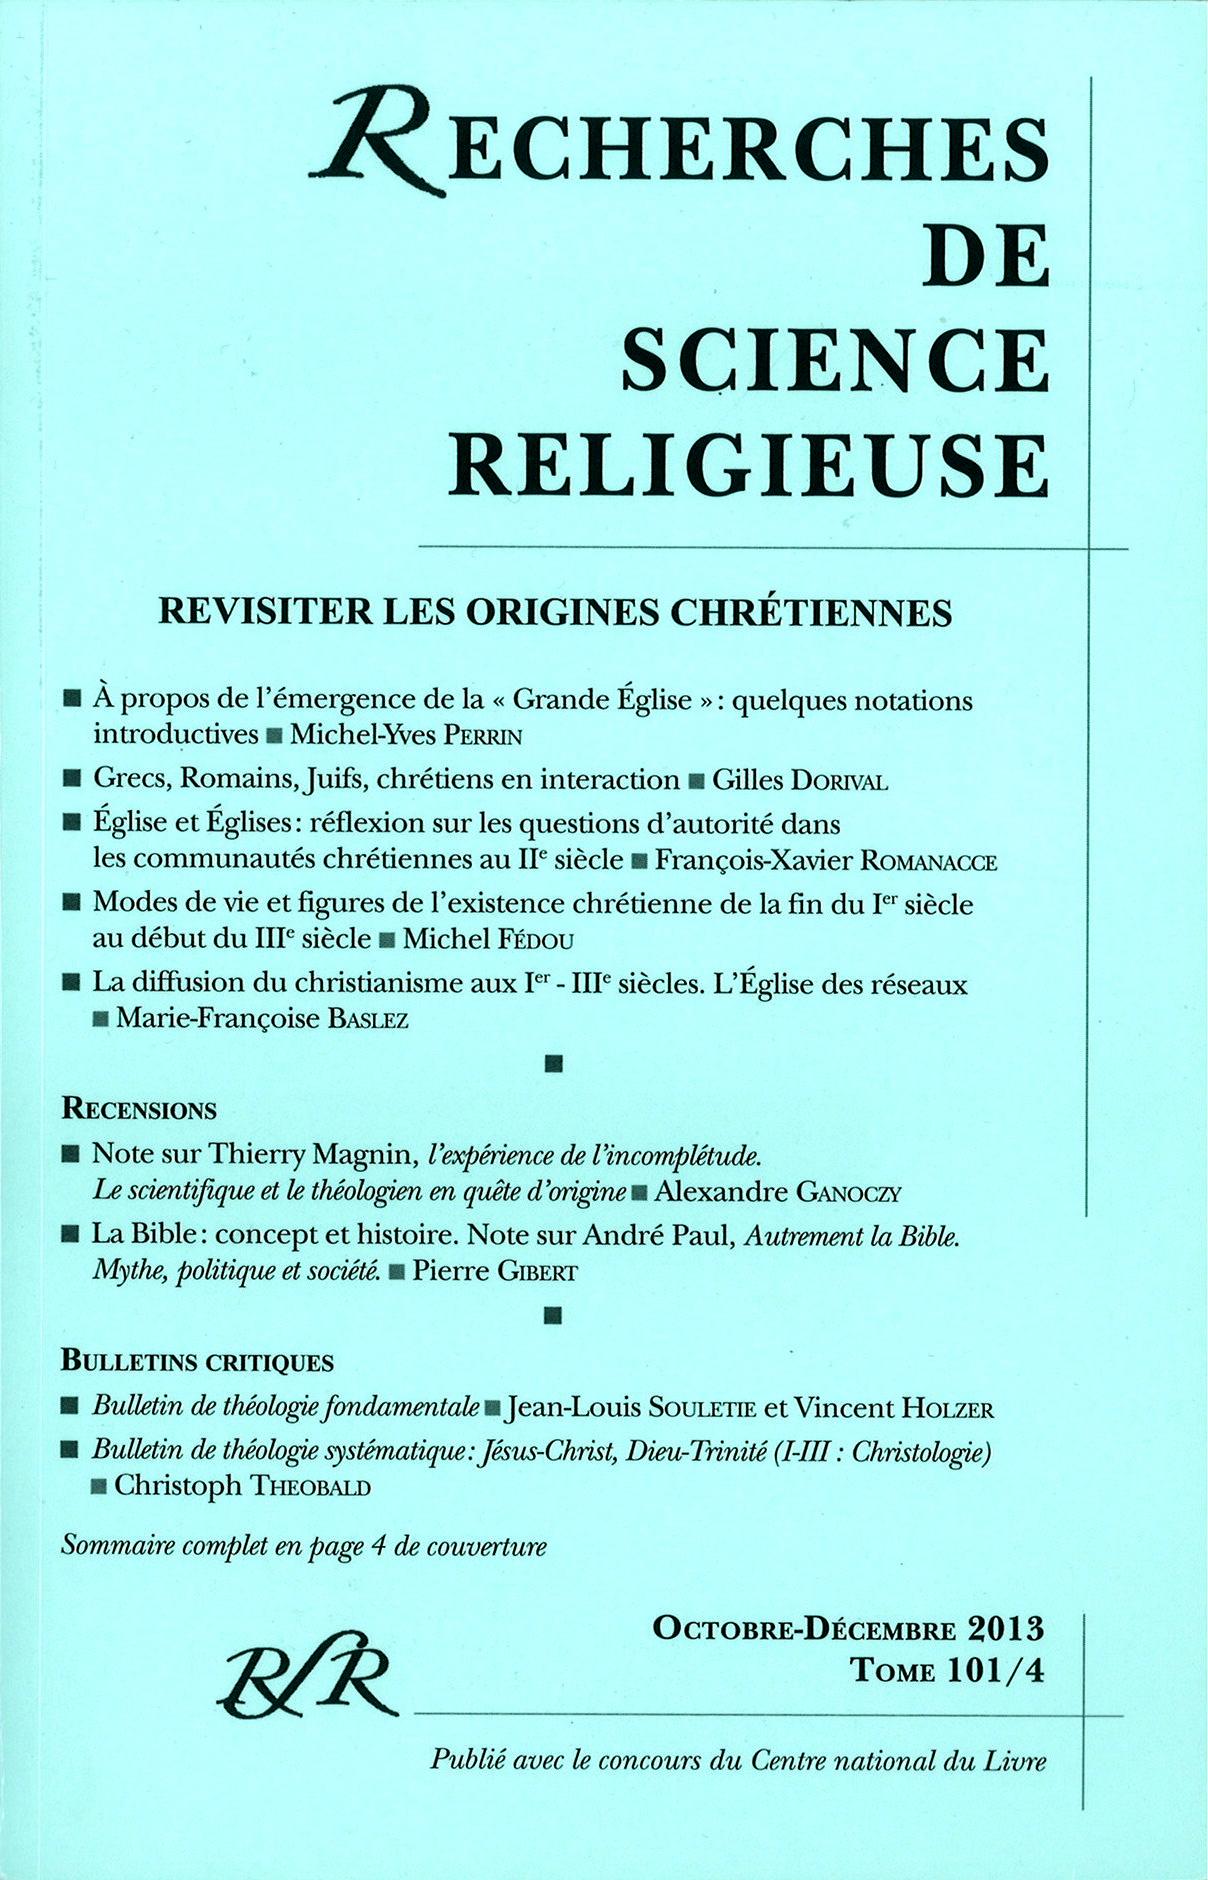 rencontres sites.org